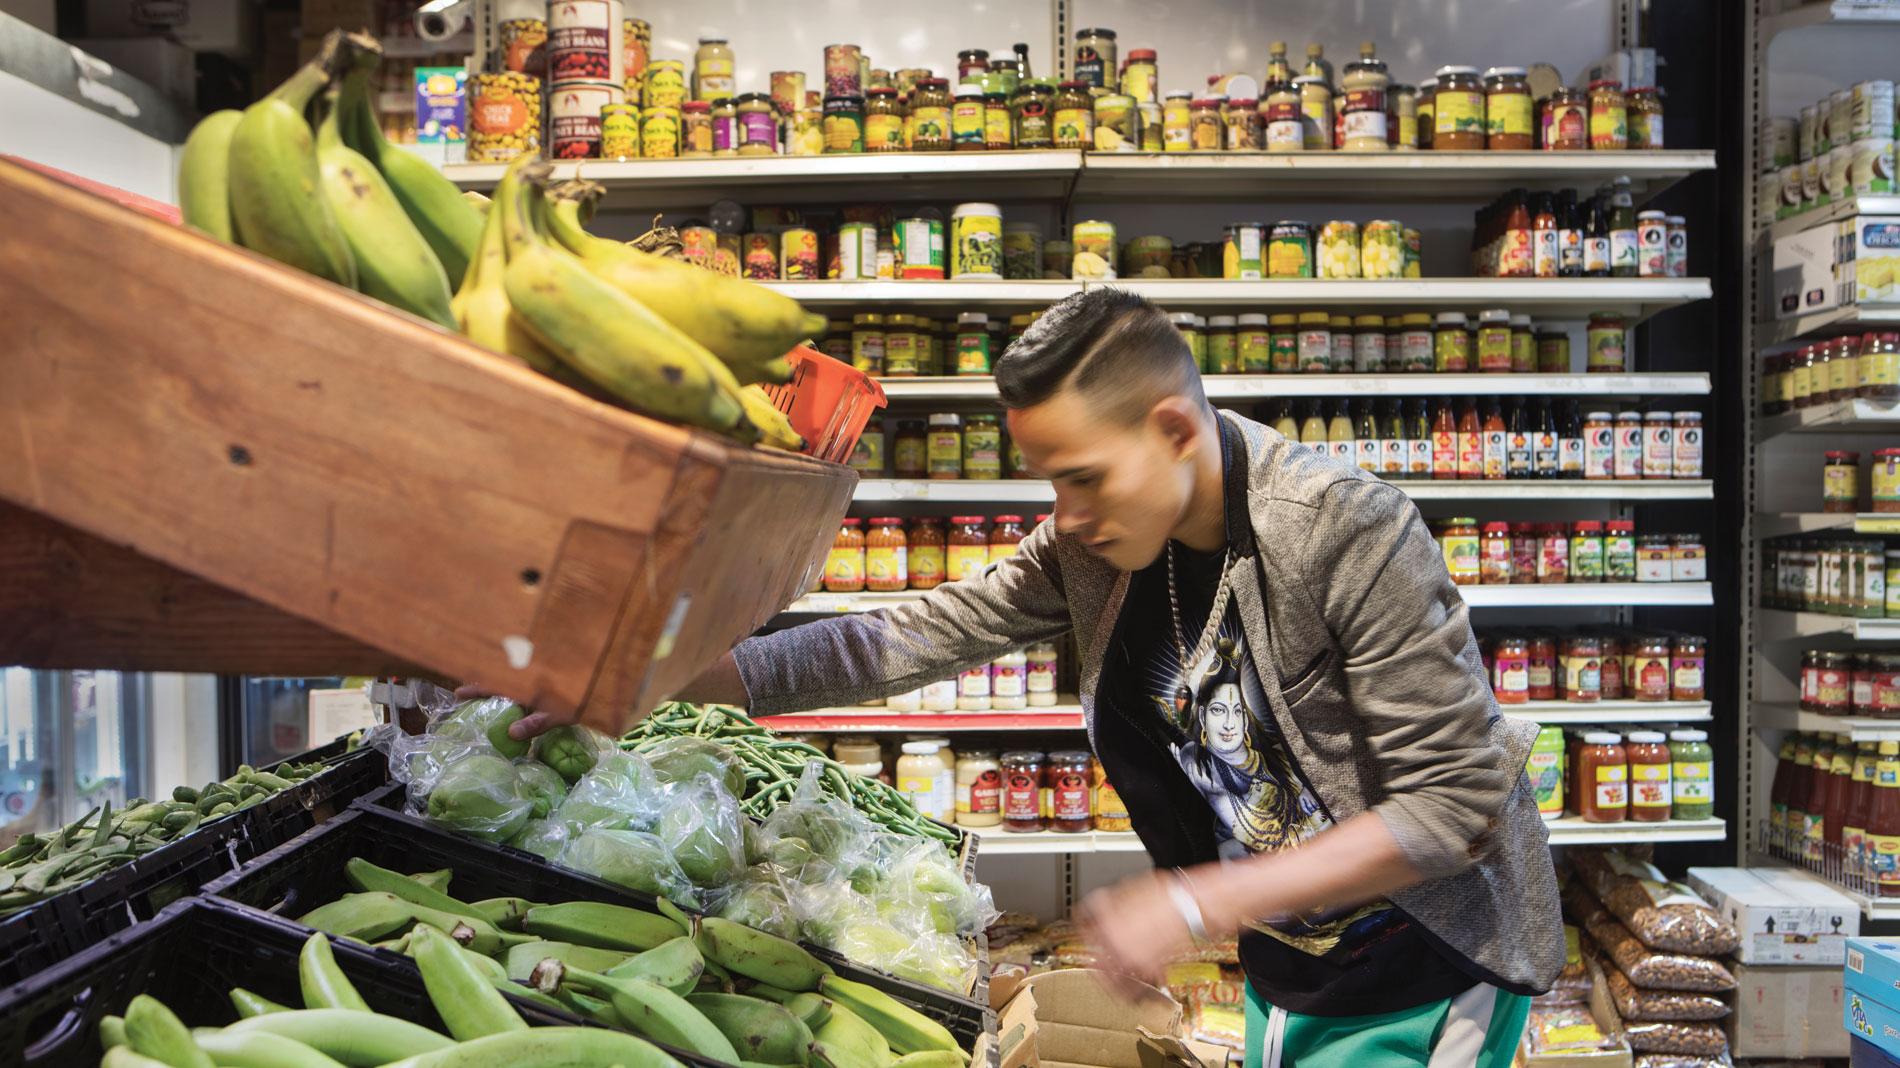 international cuisine, vegetables, international market